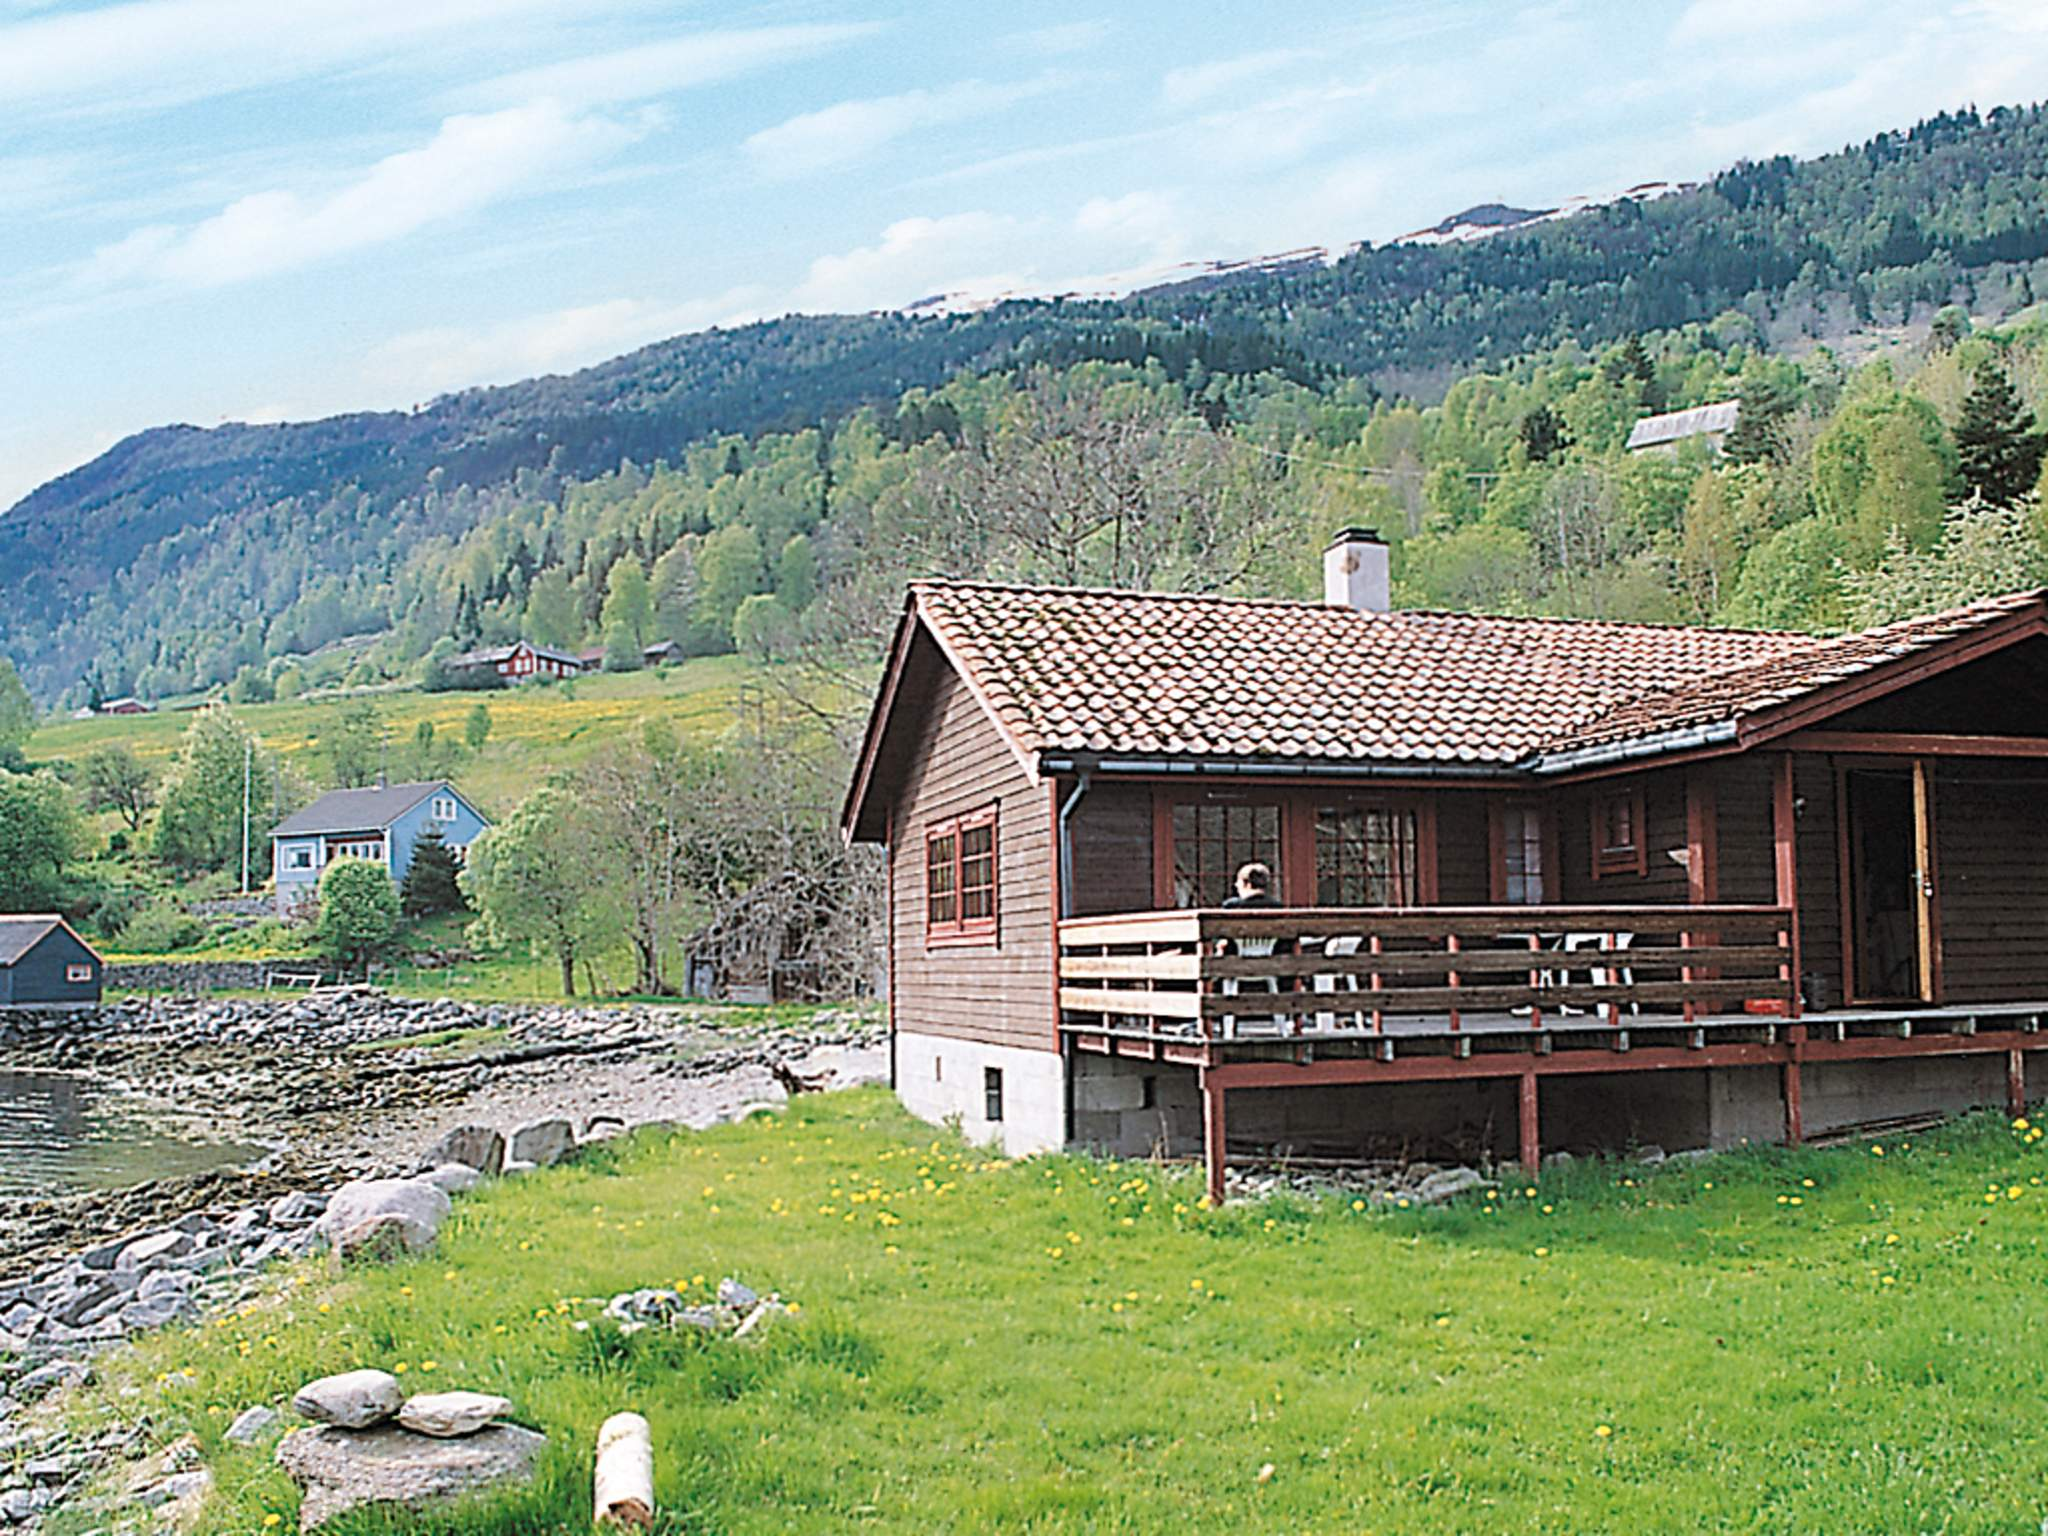 Ferienhaus Hennebygda (84645), Nordfjordeid, Sognefjord - Nordfjord, Westnorwegen, Norwegen, Bild 1